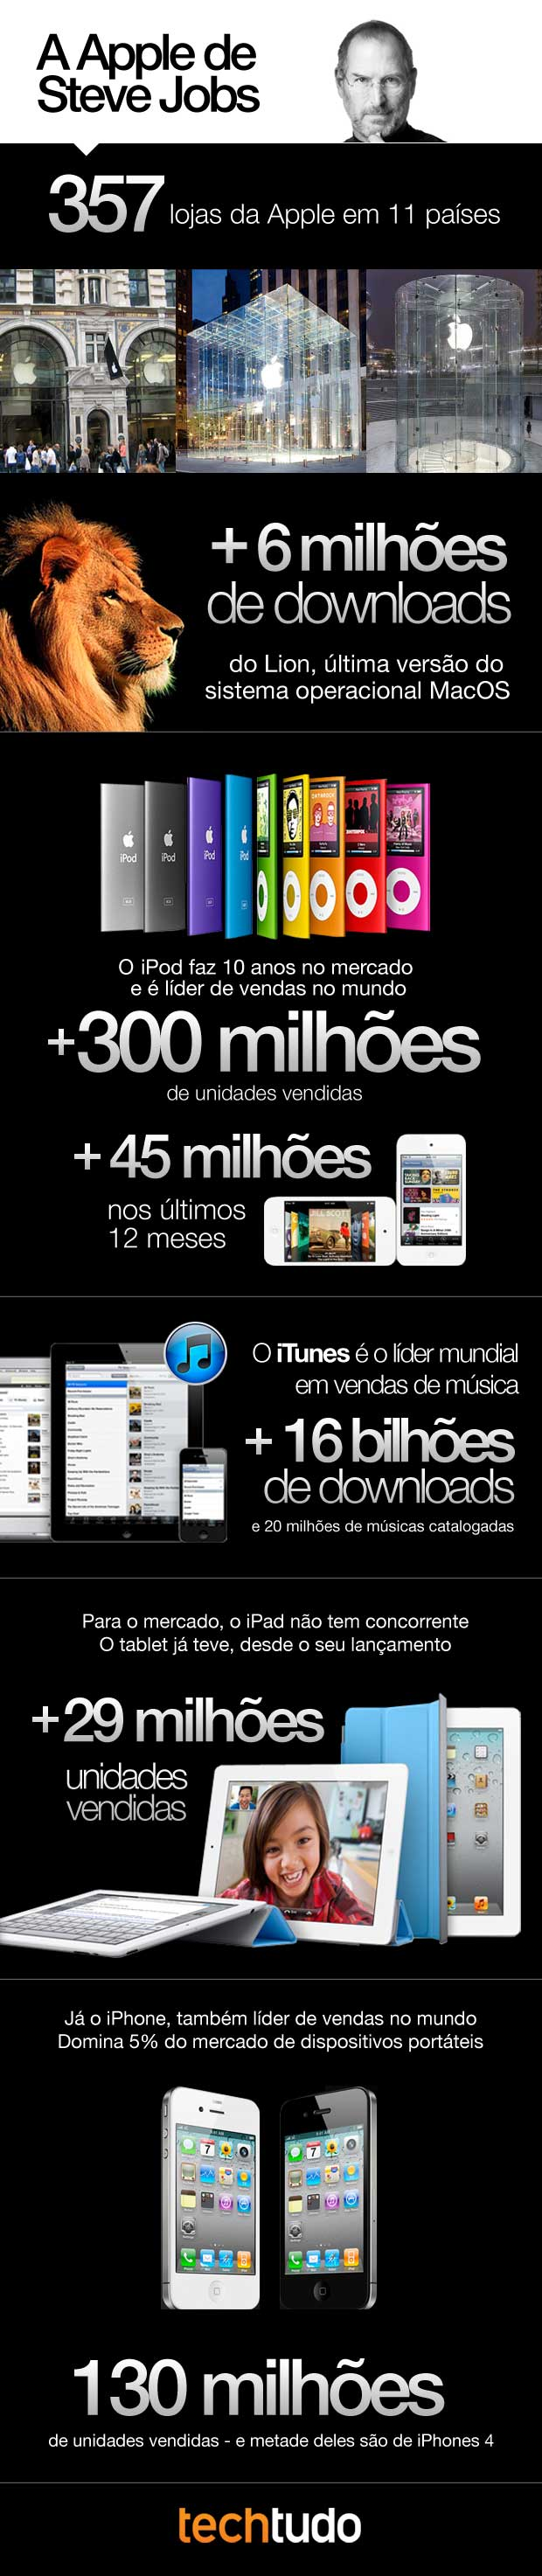 A Apple de Steve Jobs, infográfico. (Foto: TechTudo)